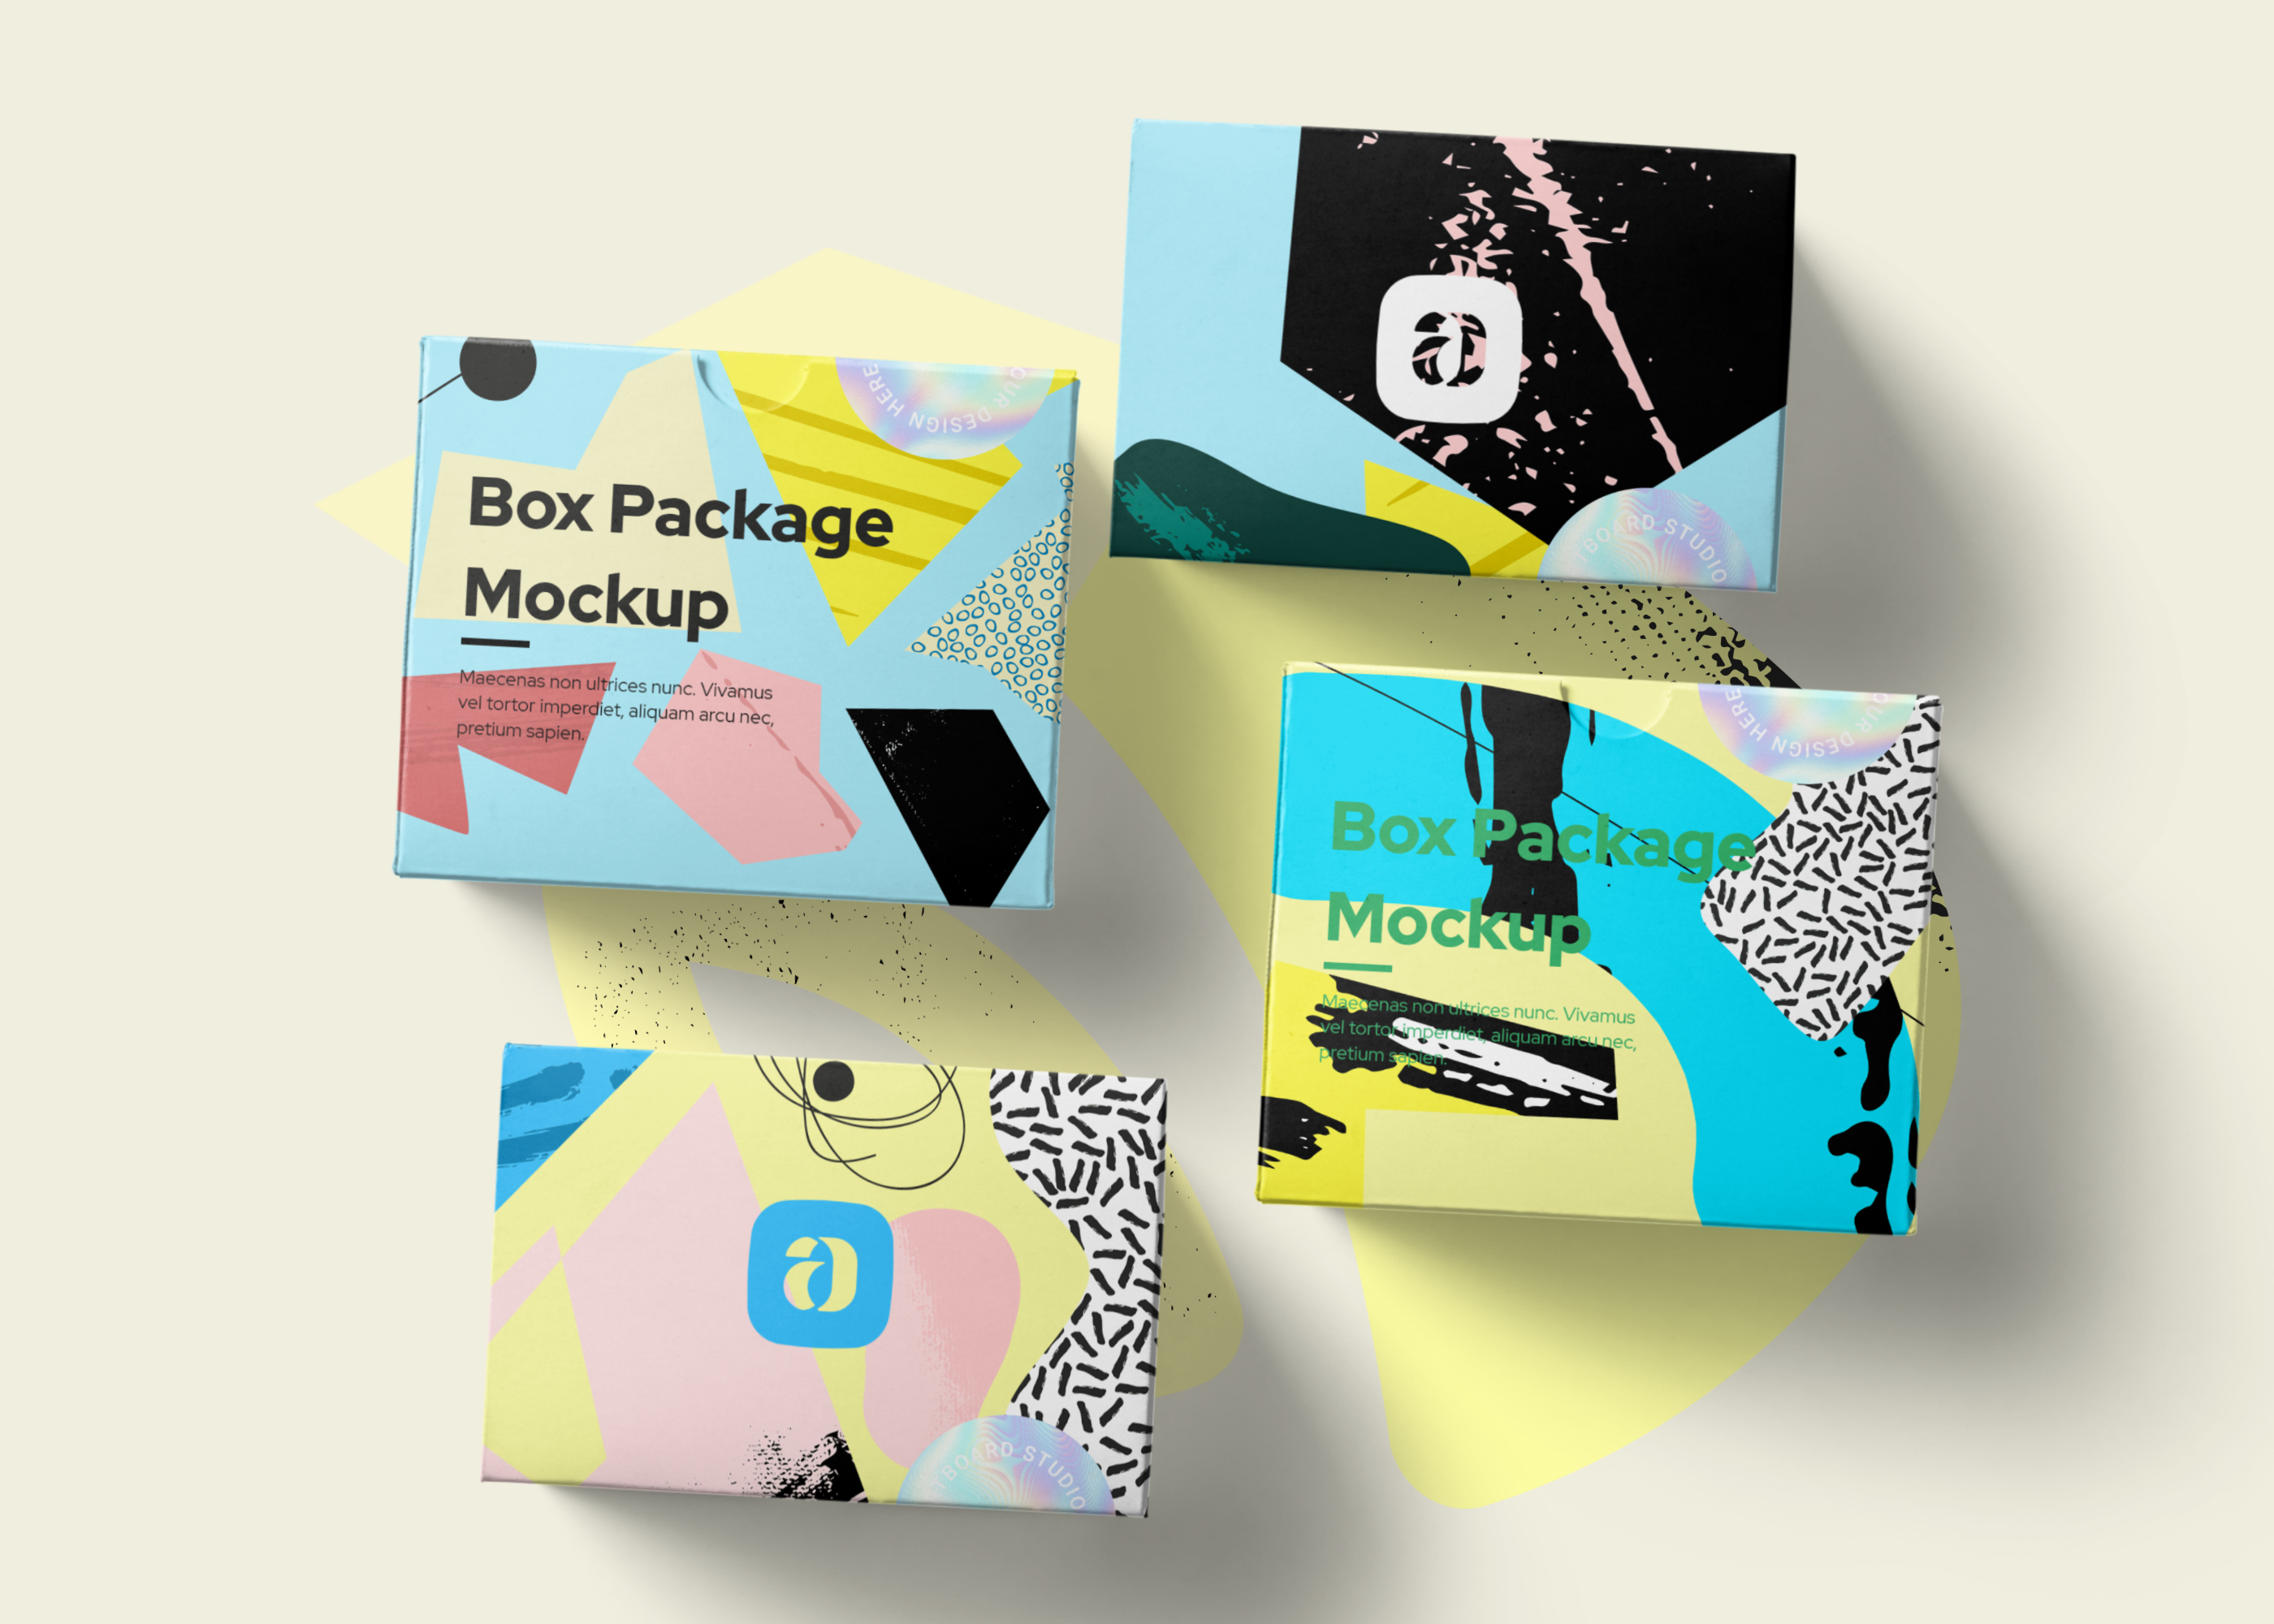 Download Box Package Mockup Scene Box Packaging Packaging Templates